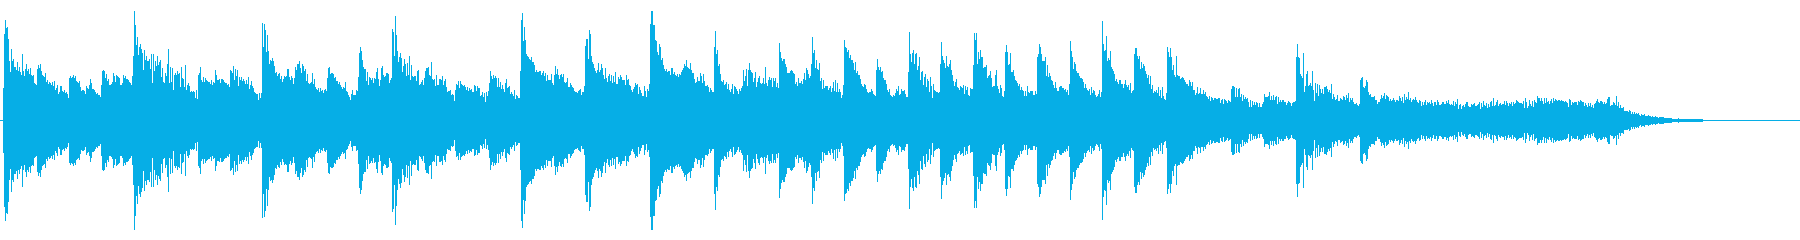 8bitなエンディング ピコピコジングルの再生済みの波形